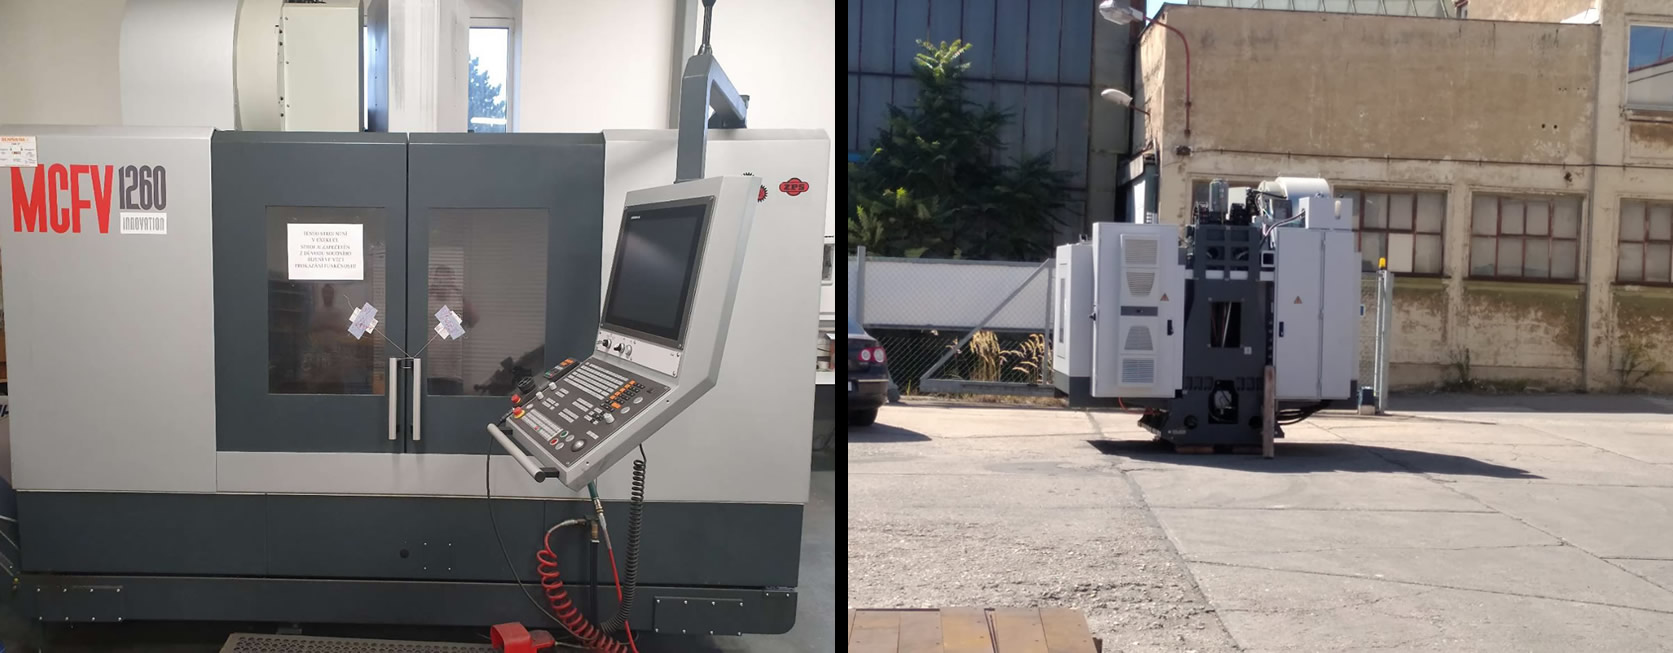 Vadný stroj Tajmac MCFV 1260i